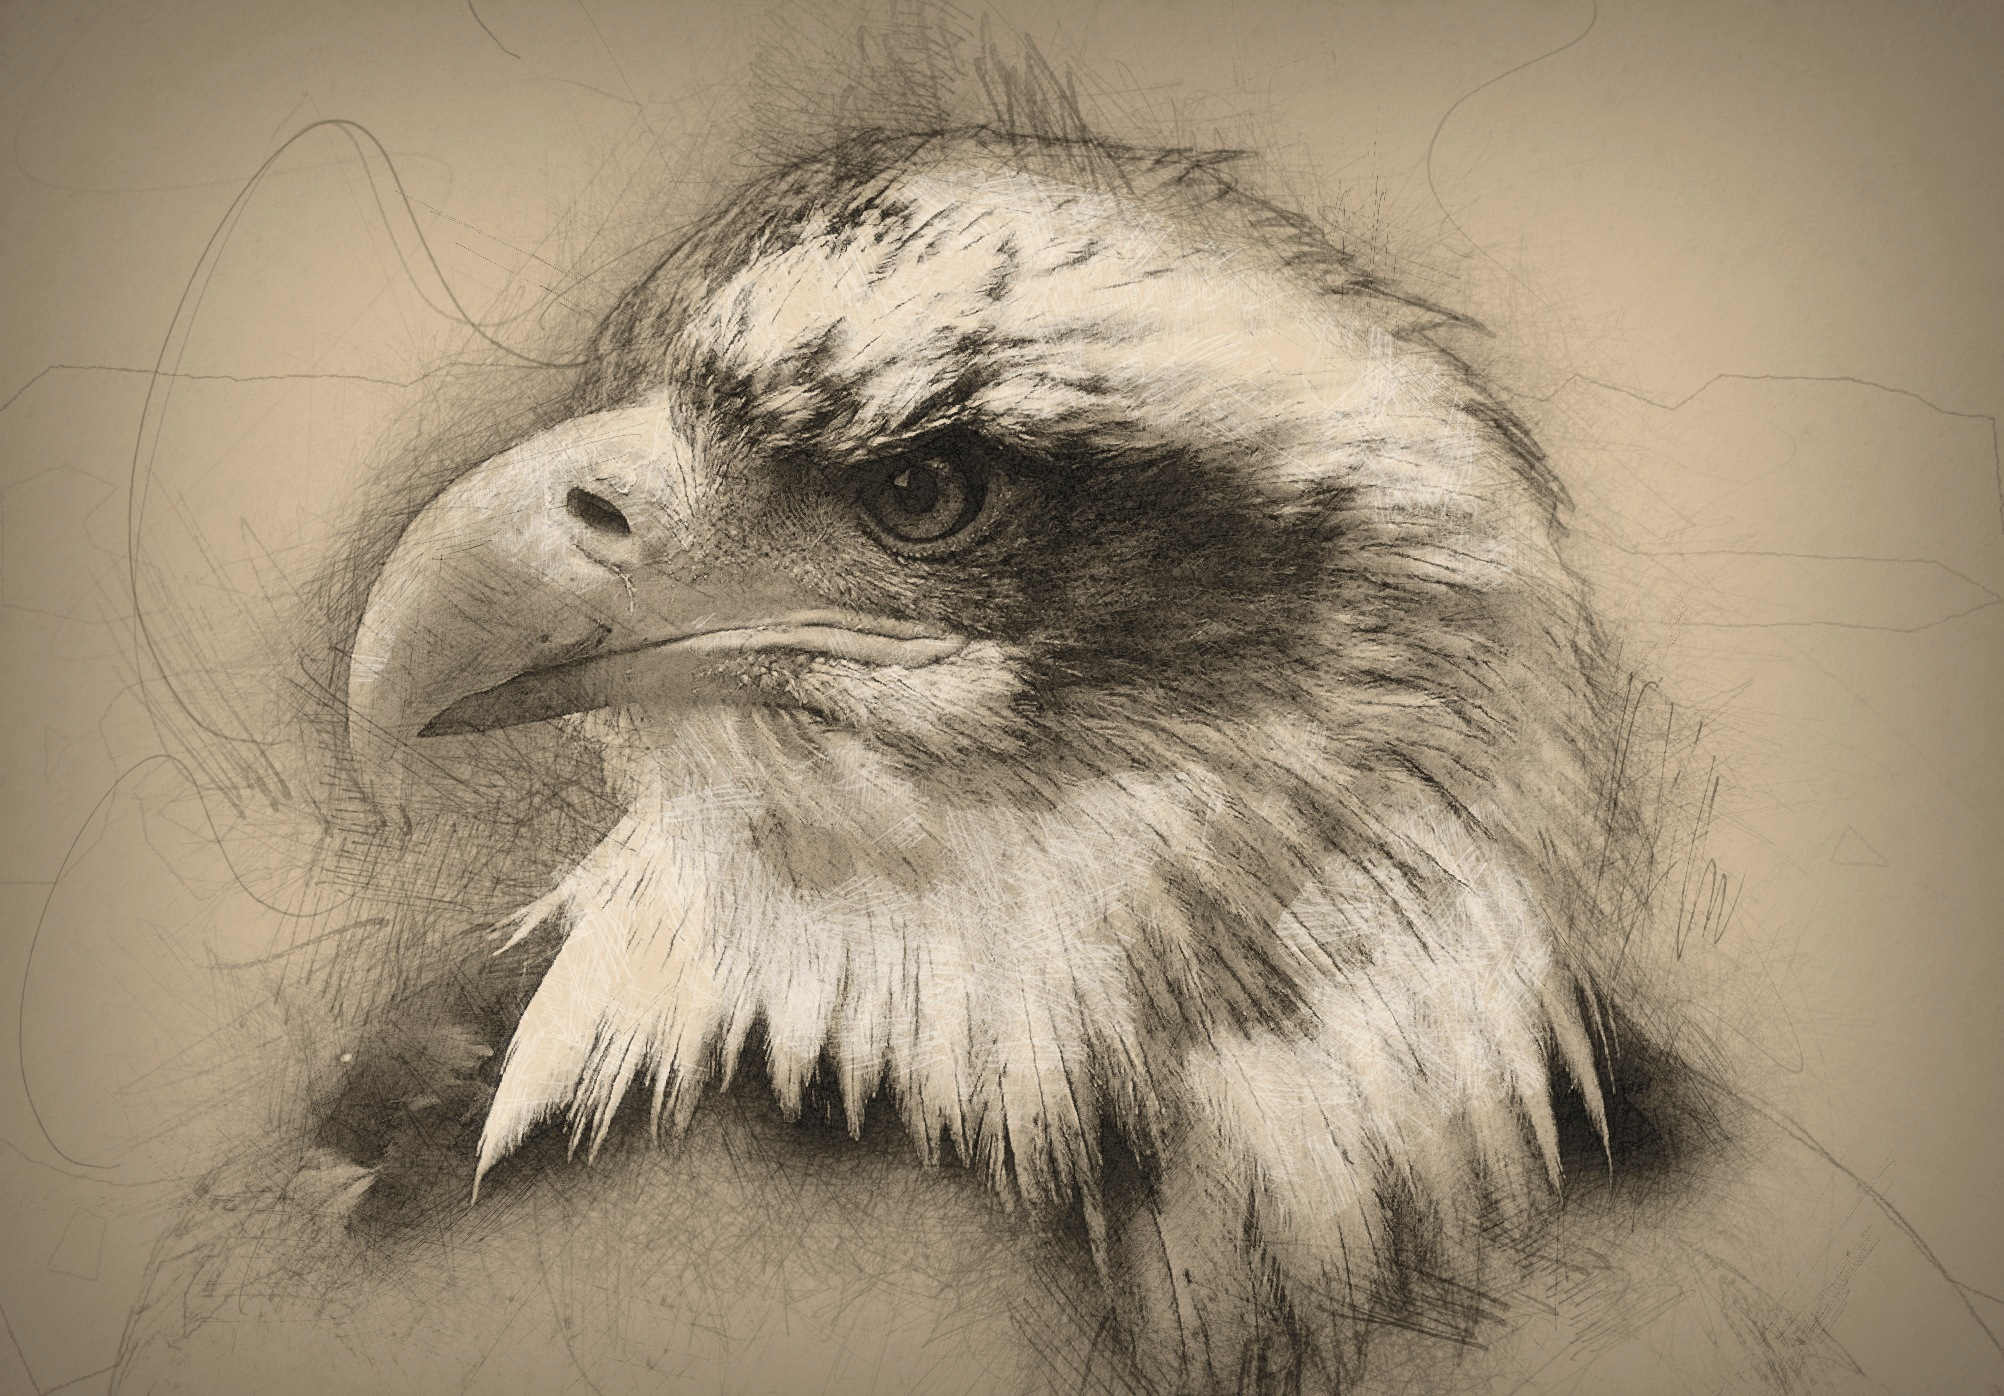 Painted Bald Eagle by Brigitte Werner